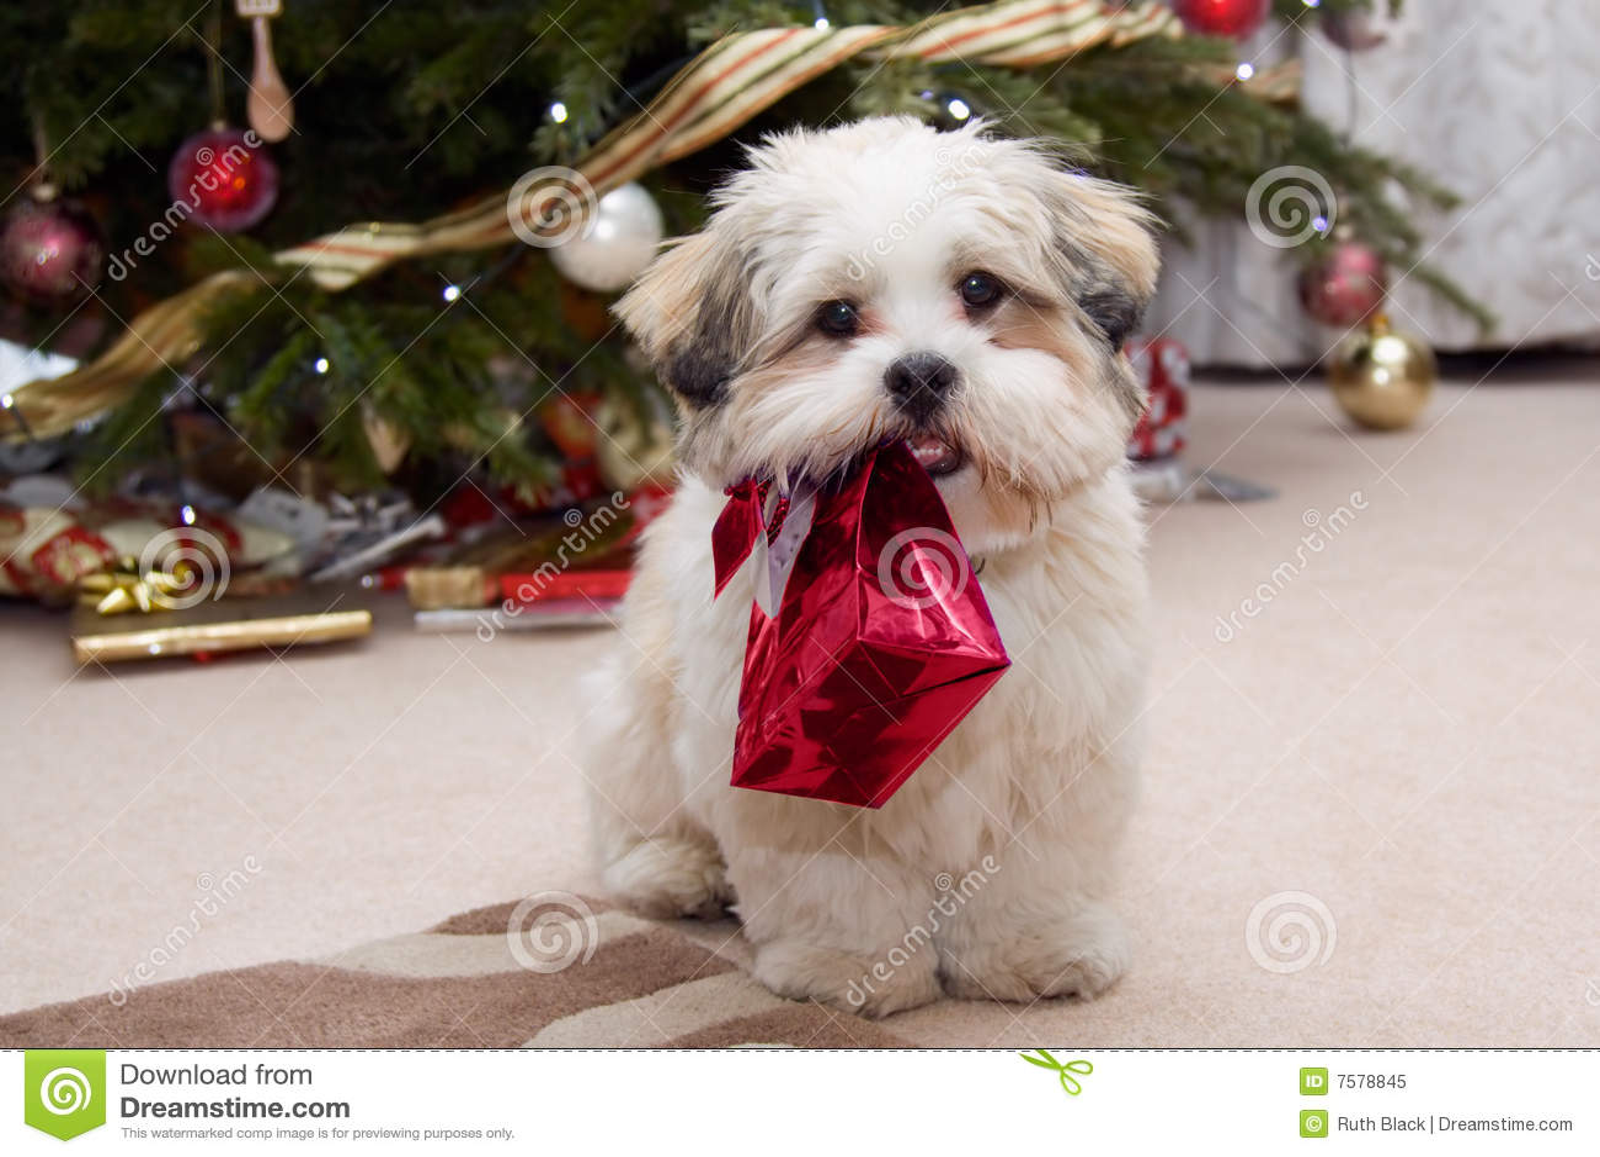 Lhasa Apso Puppy At Christmas Royalty Free Stock Photo ...